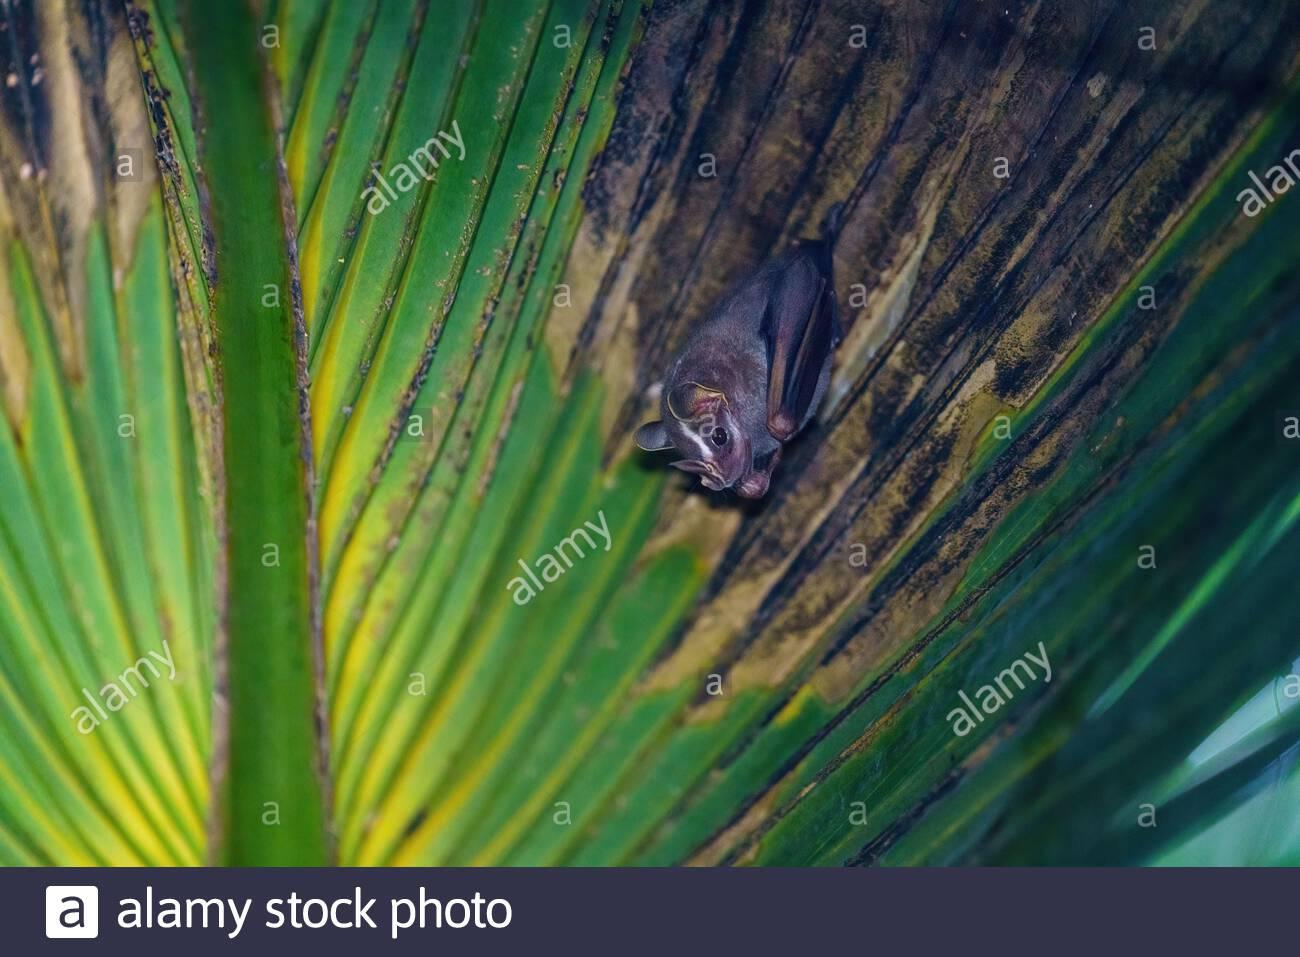 Tent-making Bat (Uroderma bilobatum) roosting in a palm frond, taken in Costa Rica Stock Photo